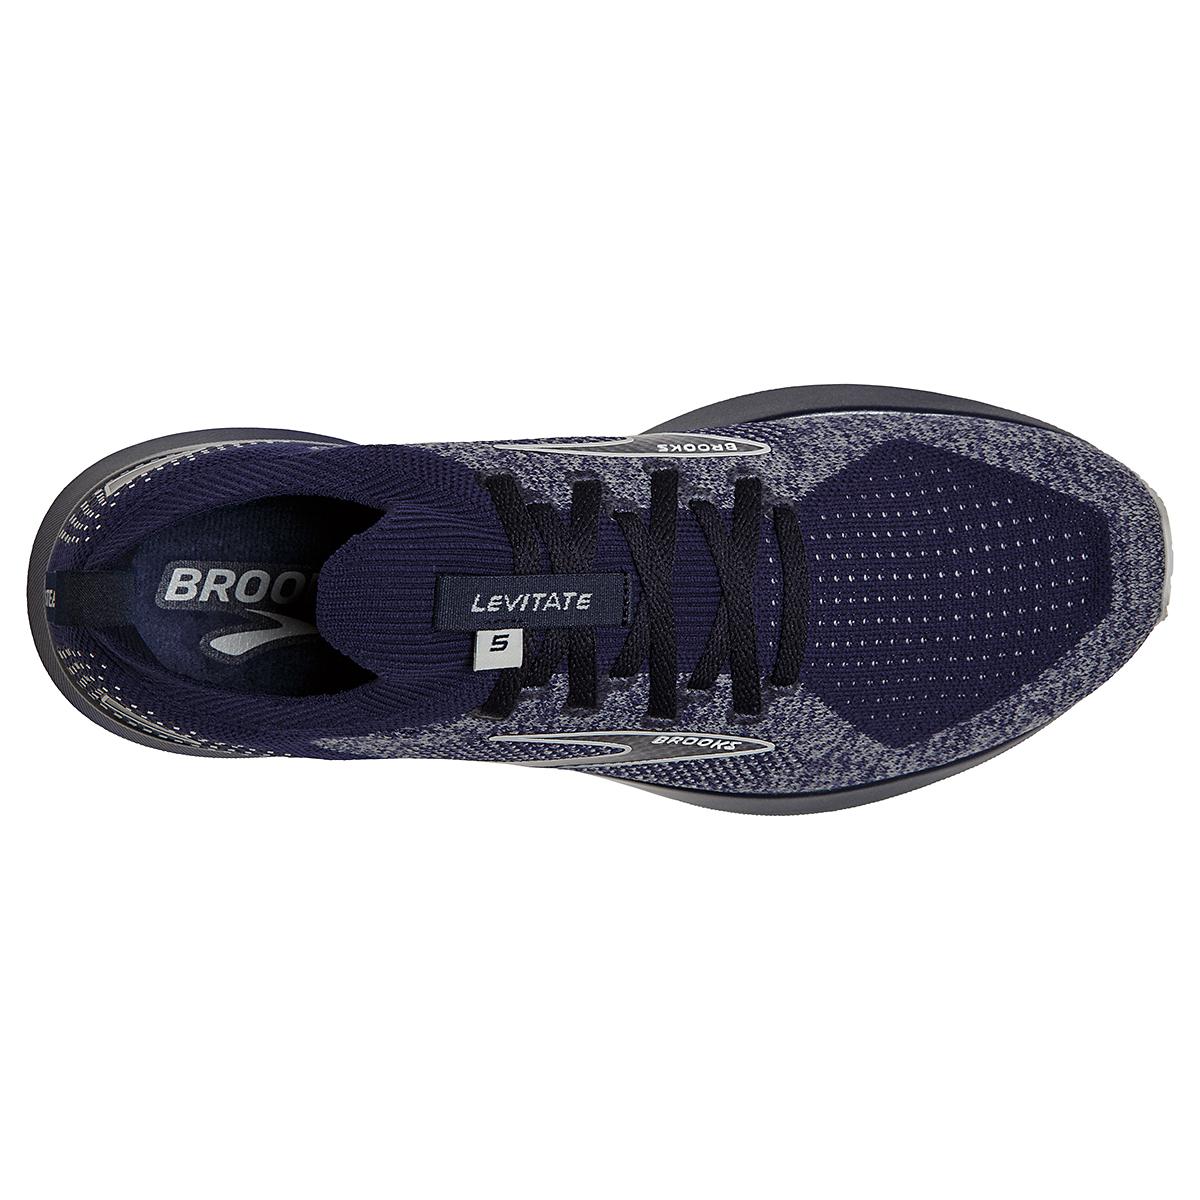 Men's Brooks Levitate Stealthfit 5 Running Shoe - Color: Peacoat/Grey - Size: 7 - Width: Regular, Peacoat/Grey, large, image 5